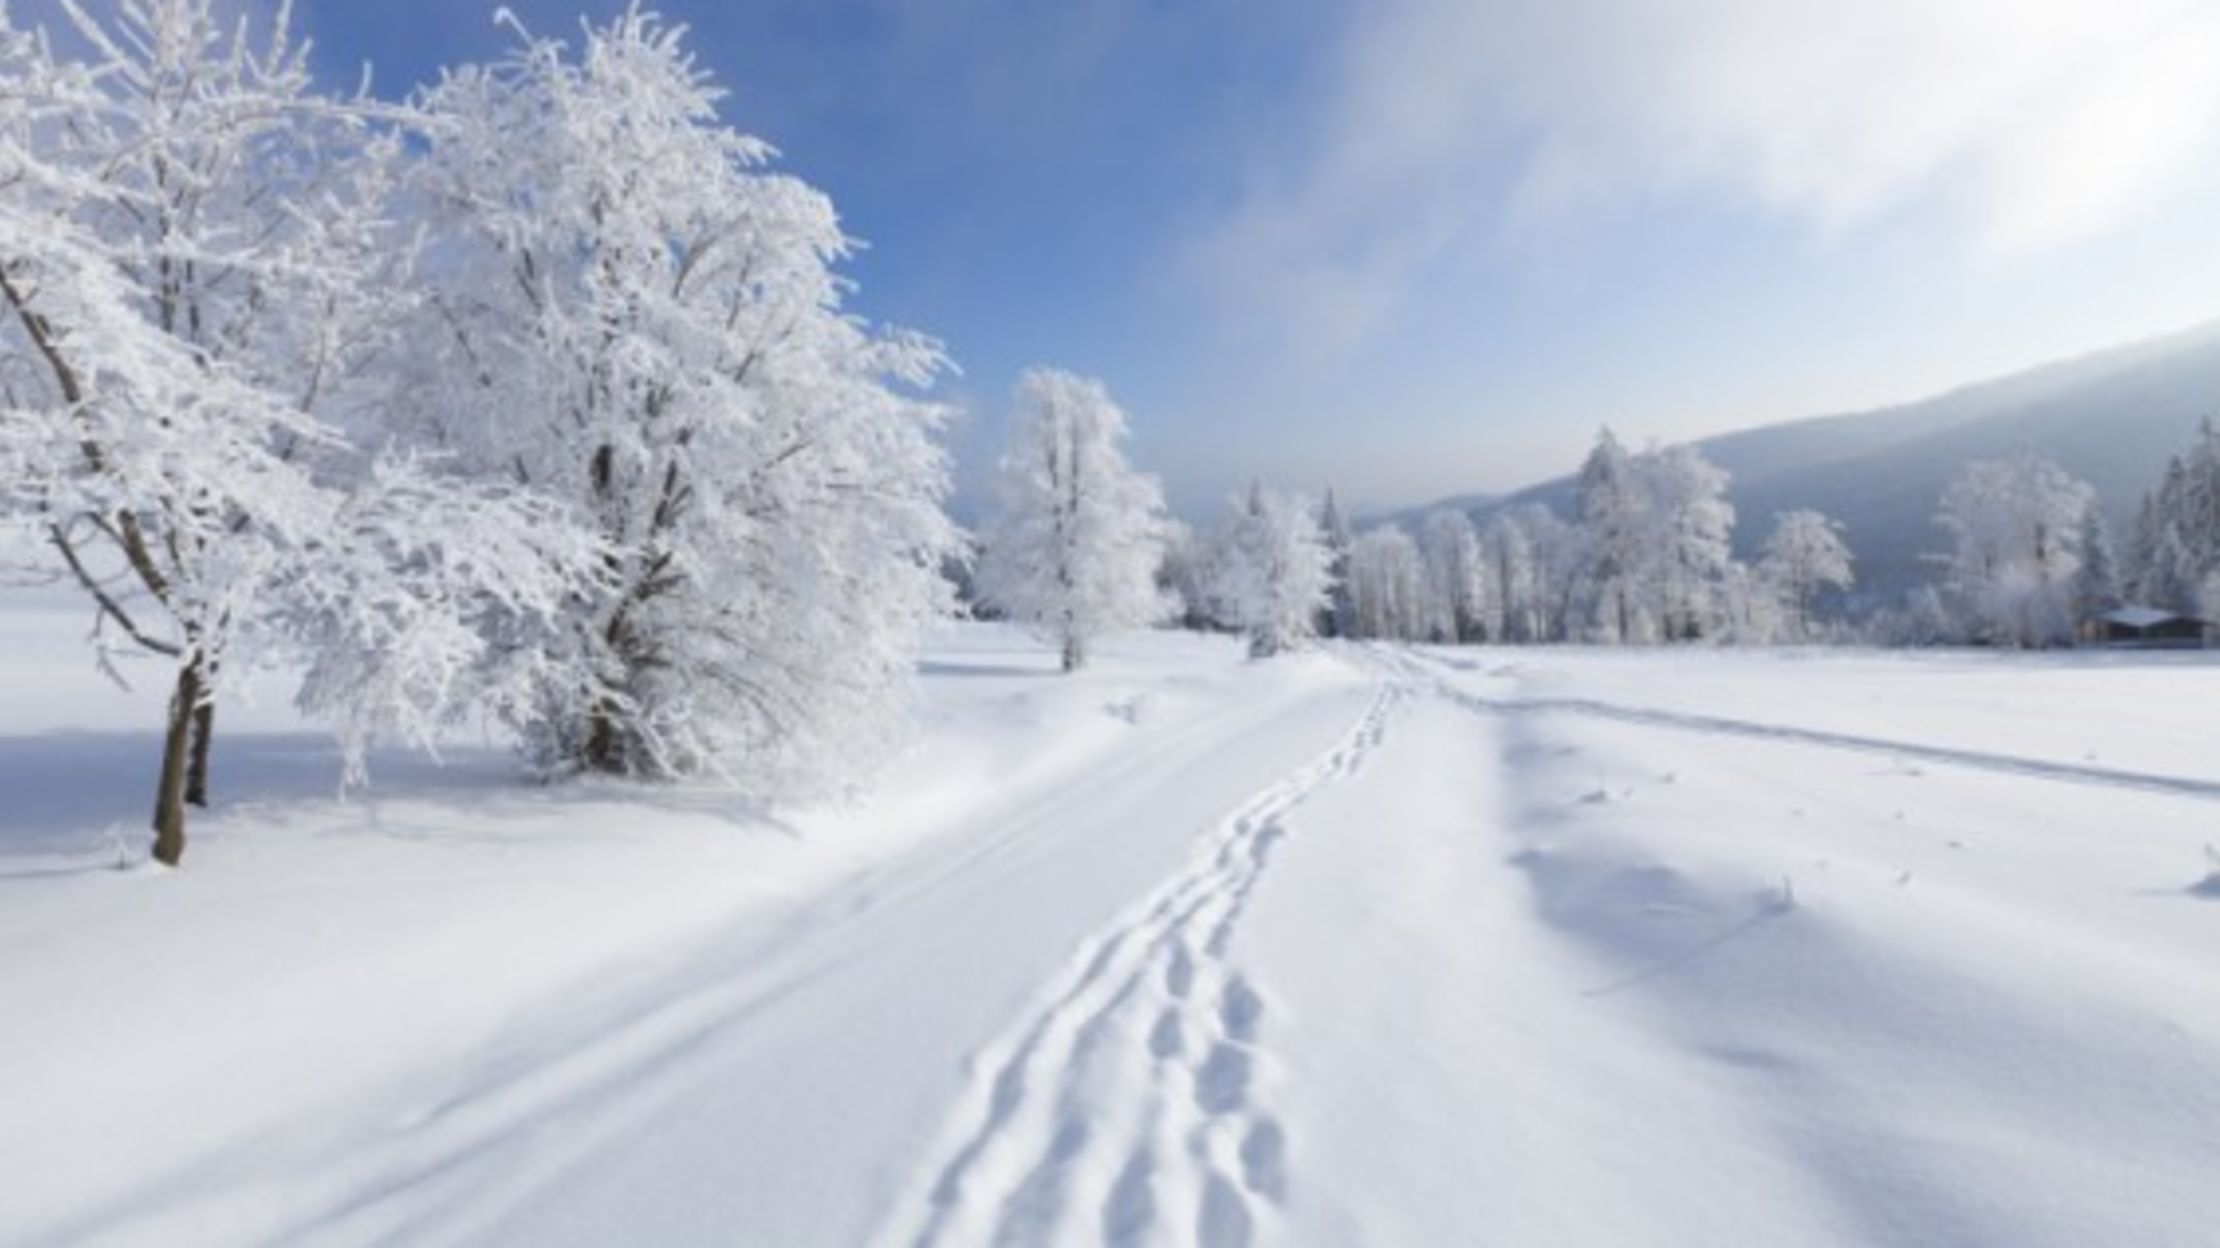 8 Beautiful Snow Scenes from Literature | Mental Floss